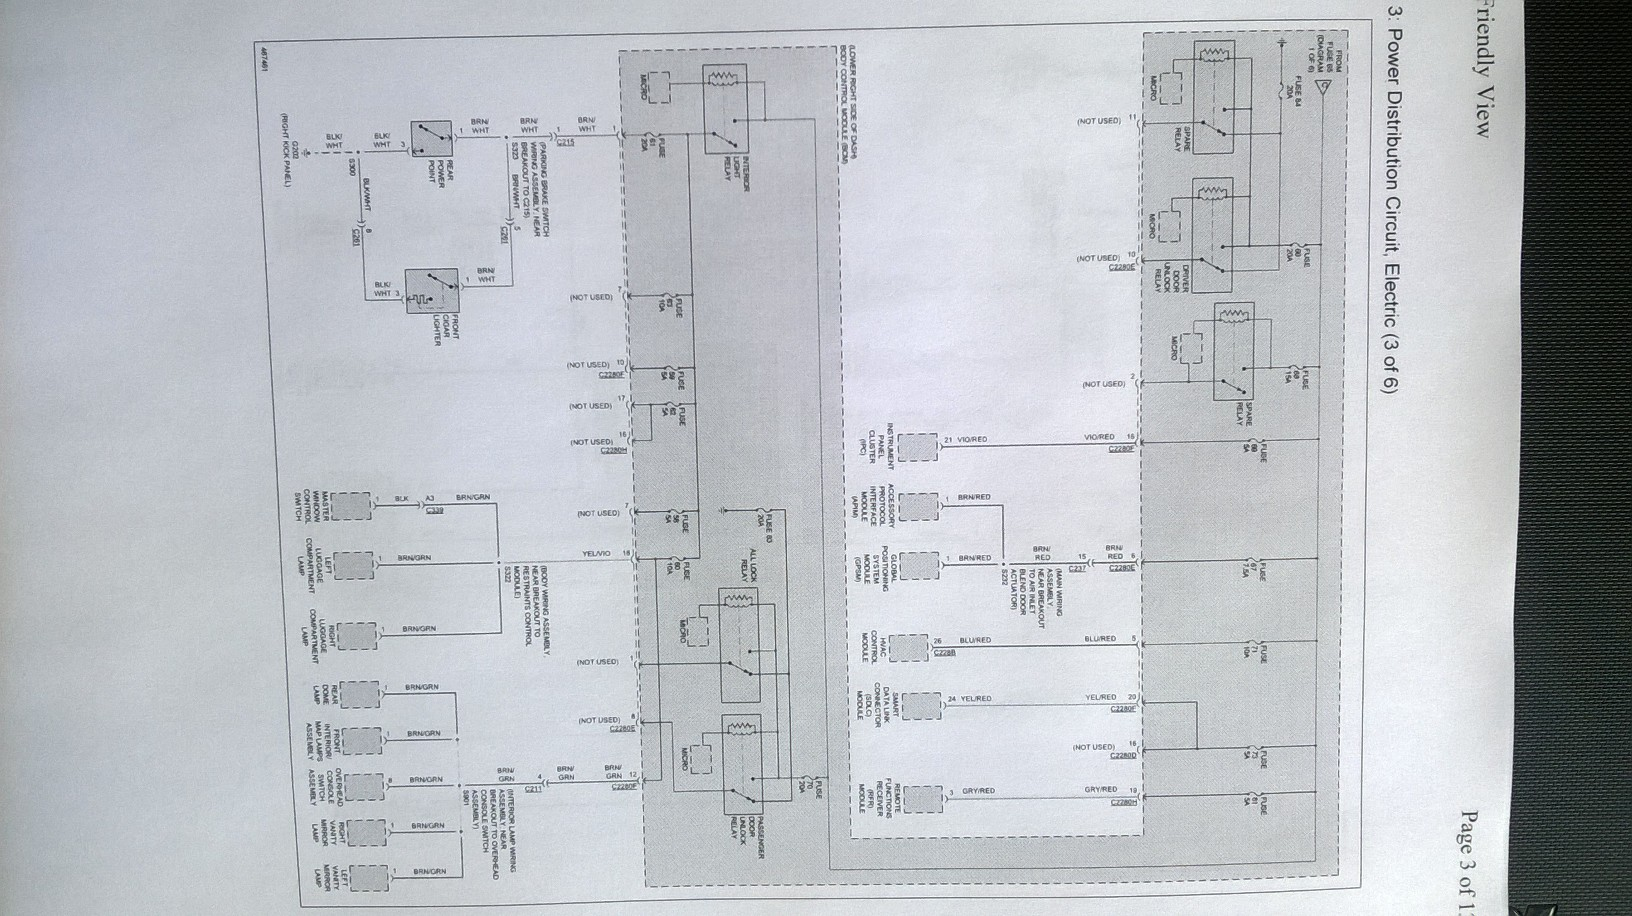 132100d1465661356 2015 focus st3 wiring diagram wp_20160611_007 2015 focus st3 wiring diagram 2016 Focus St Interior at n-0.co